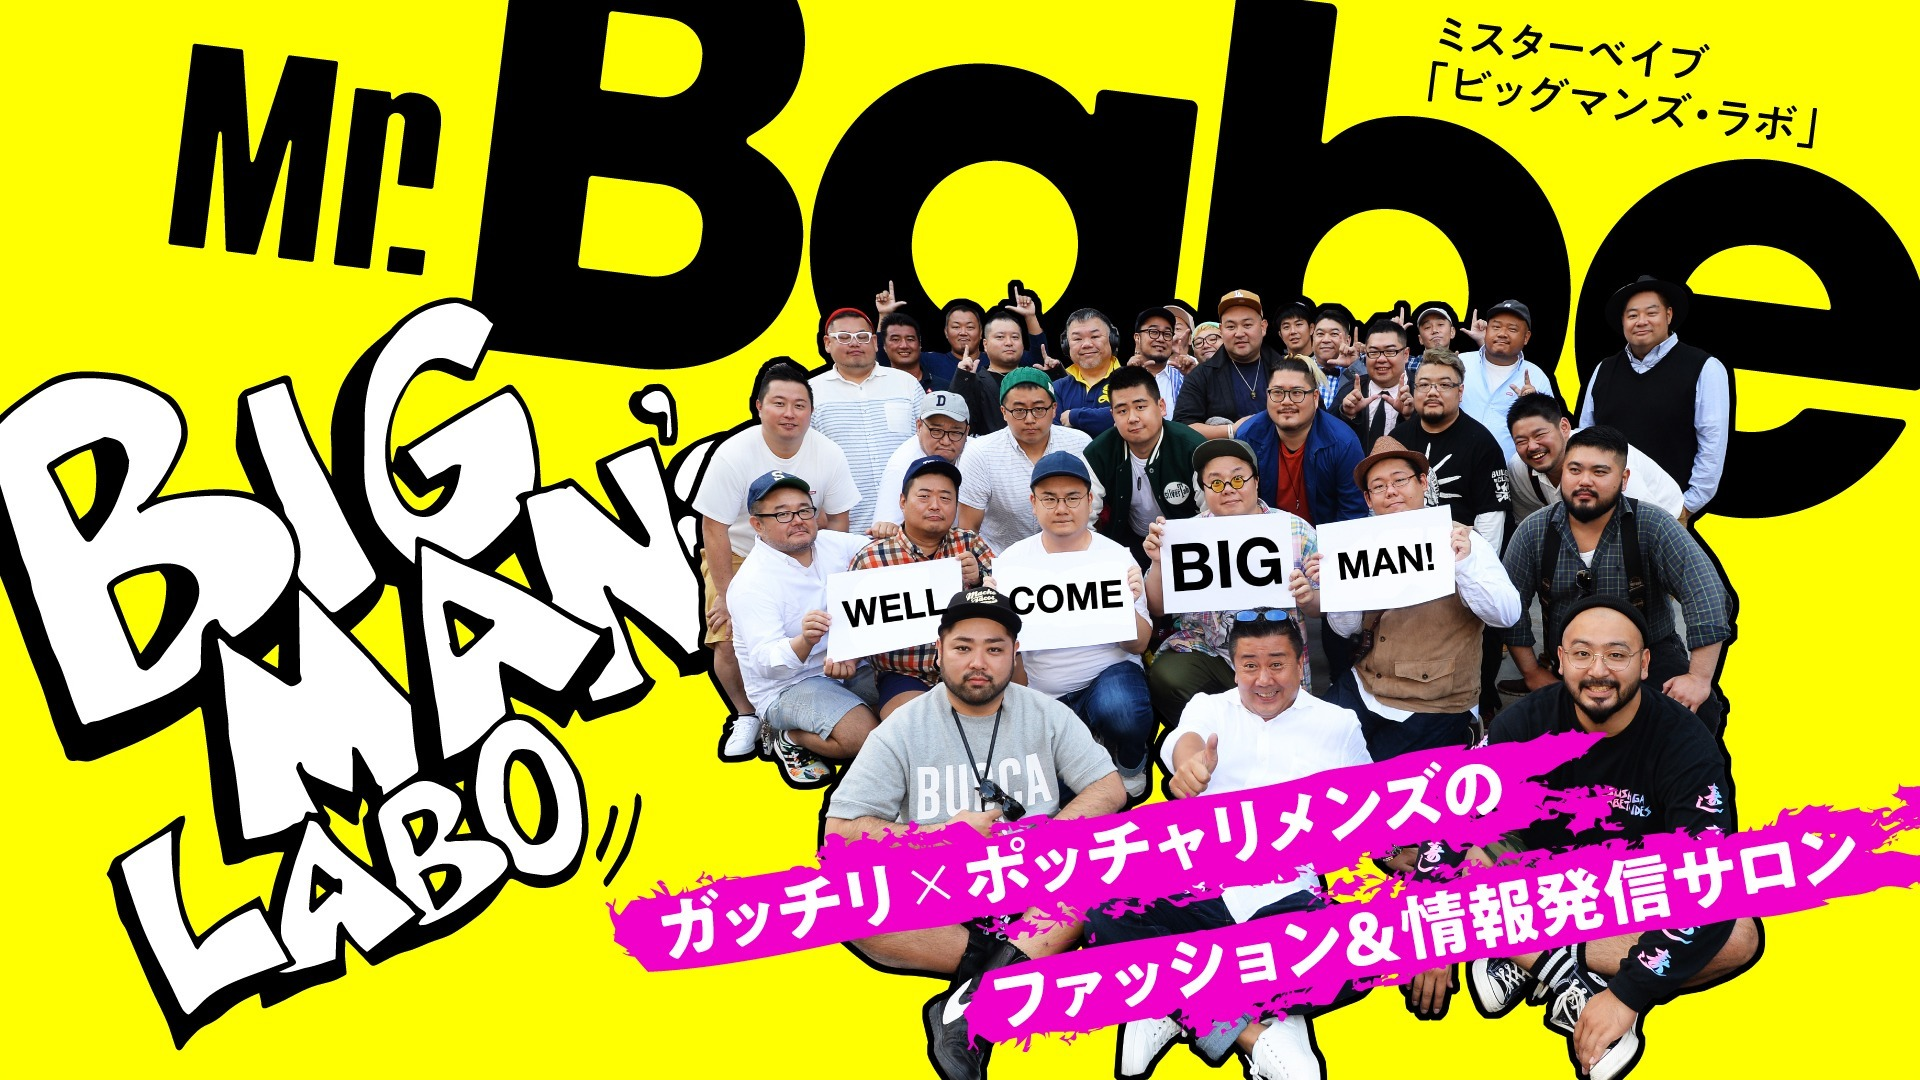 Mr.Babe BIG MAN's LABO Mr.Babeウェブマガジン編集長@倉科典仁